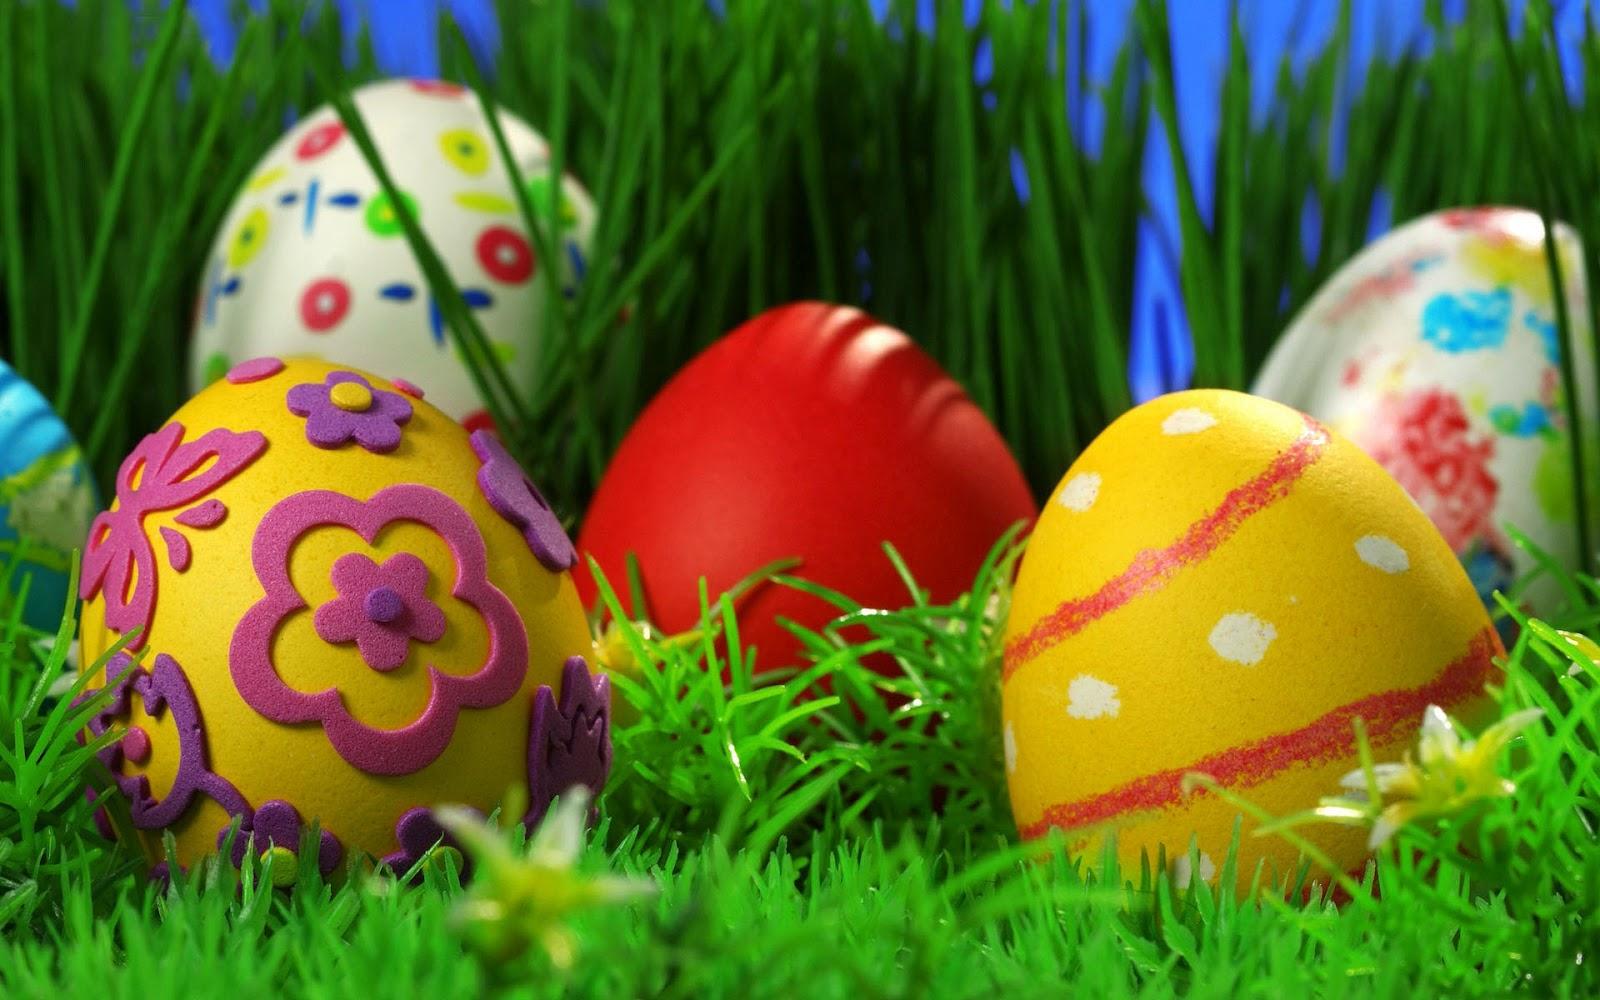 happy easter eggs hd - photo #11